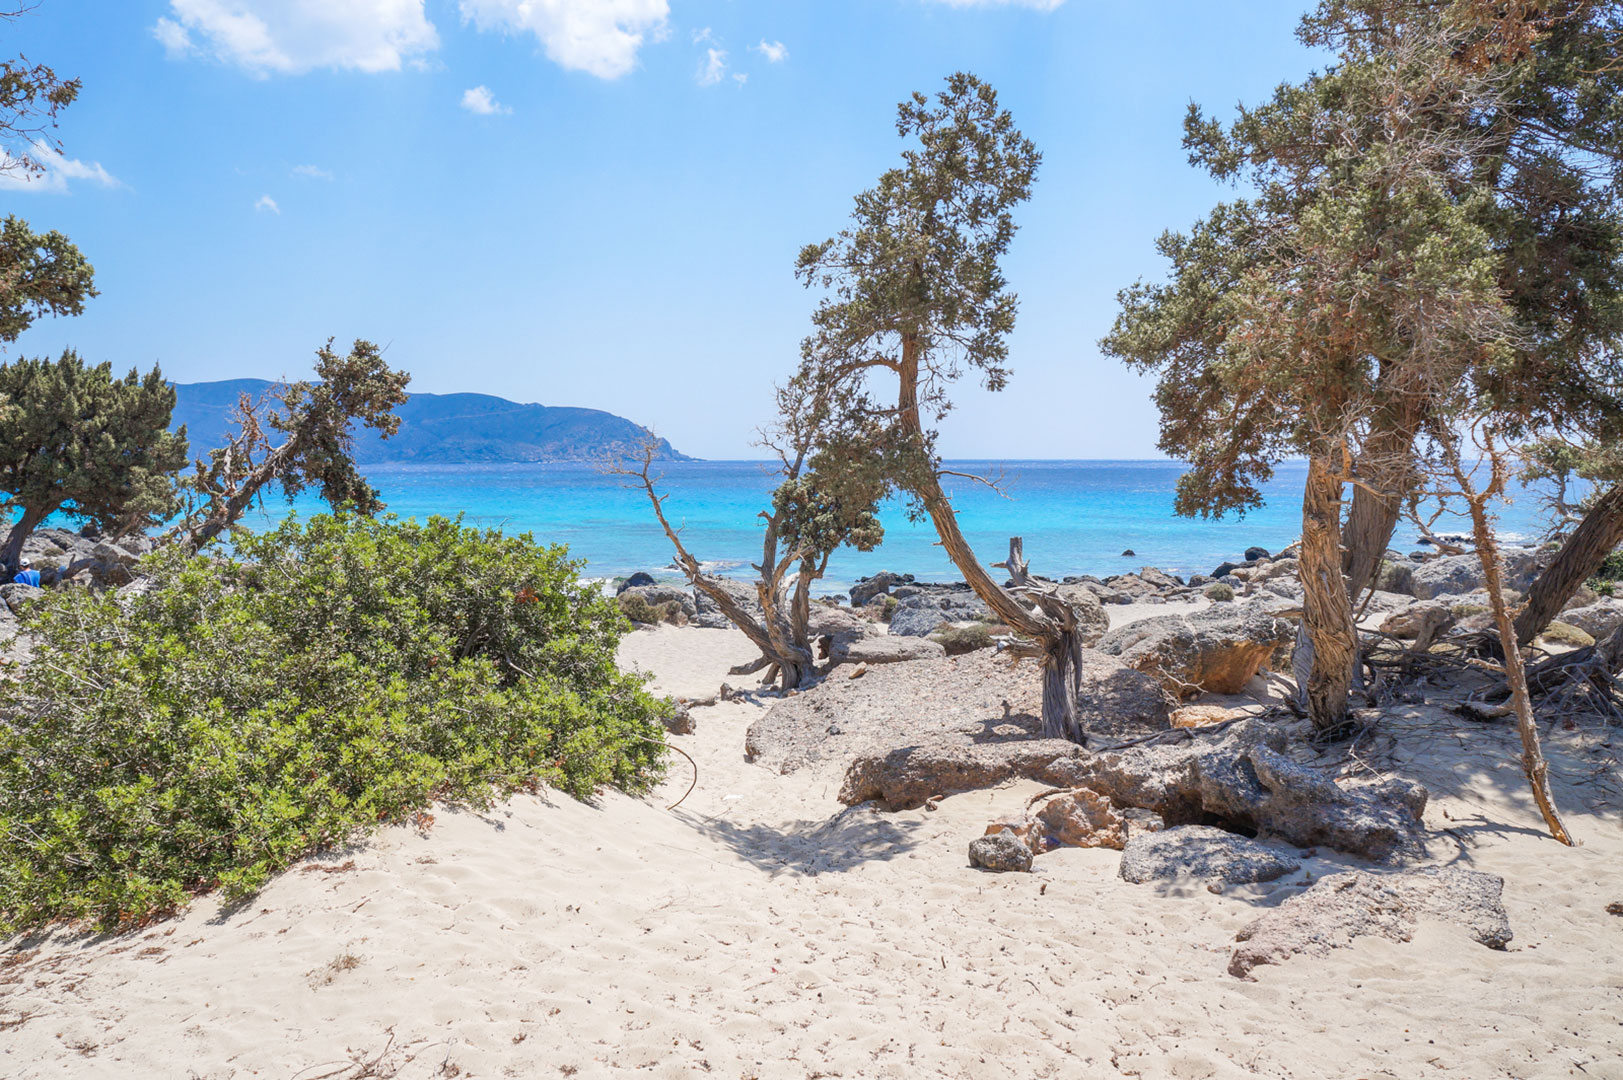 kedrodasos-crete-greece-la-vie-en-blog-all-rights-reserved-23